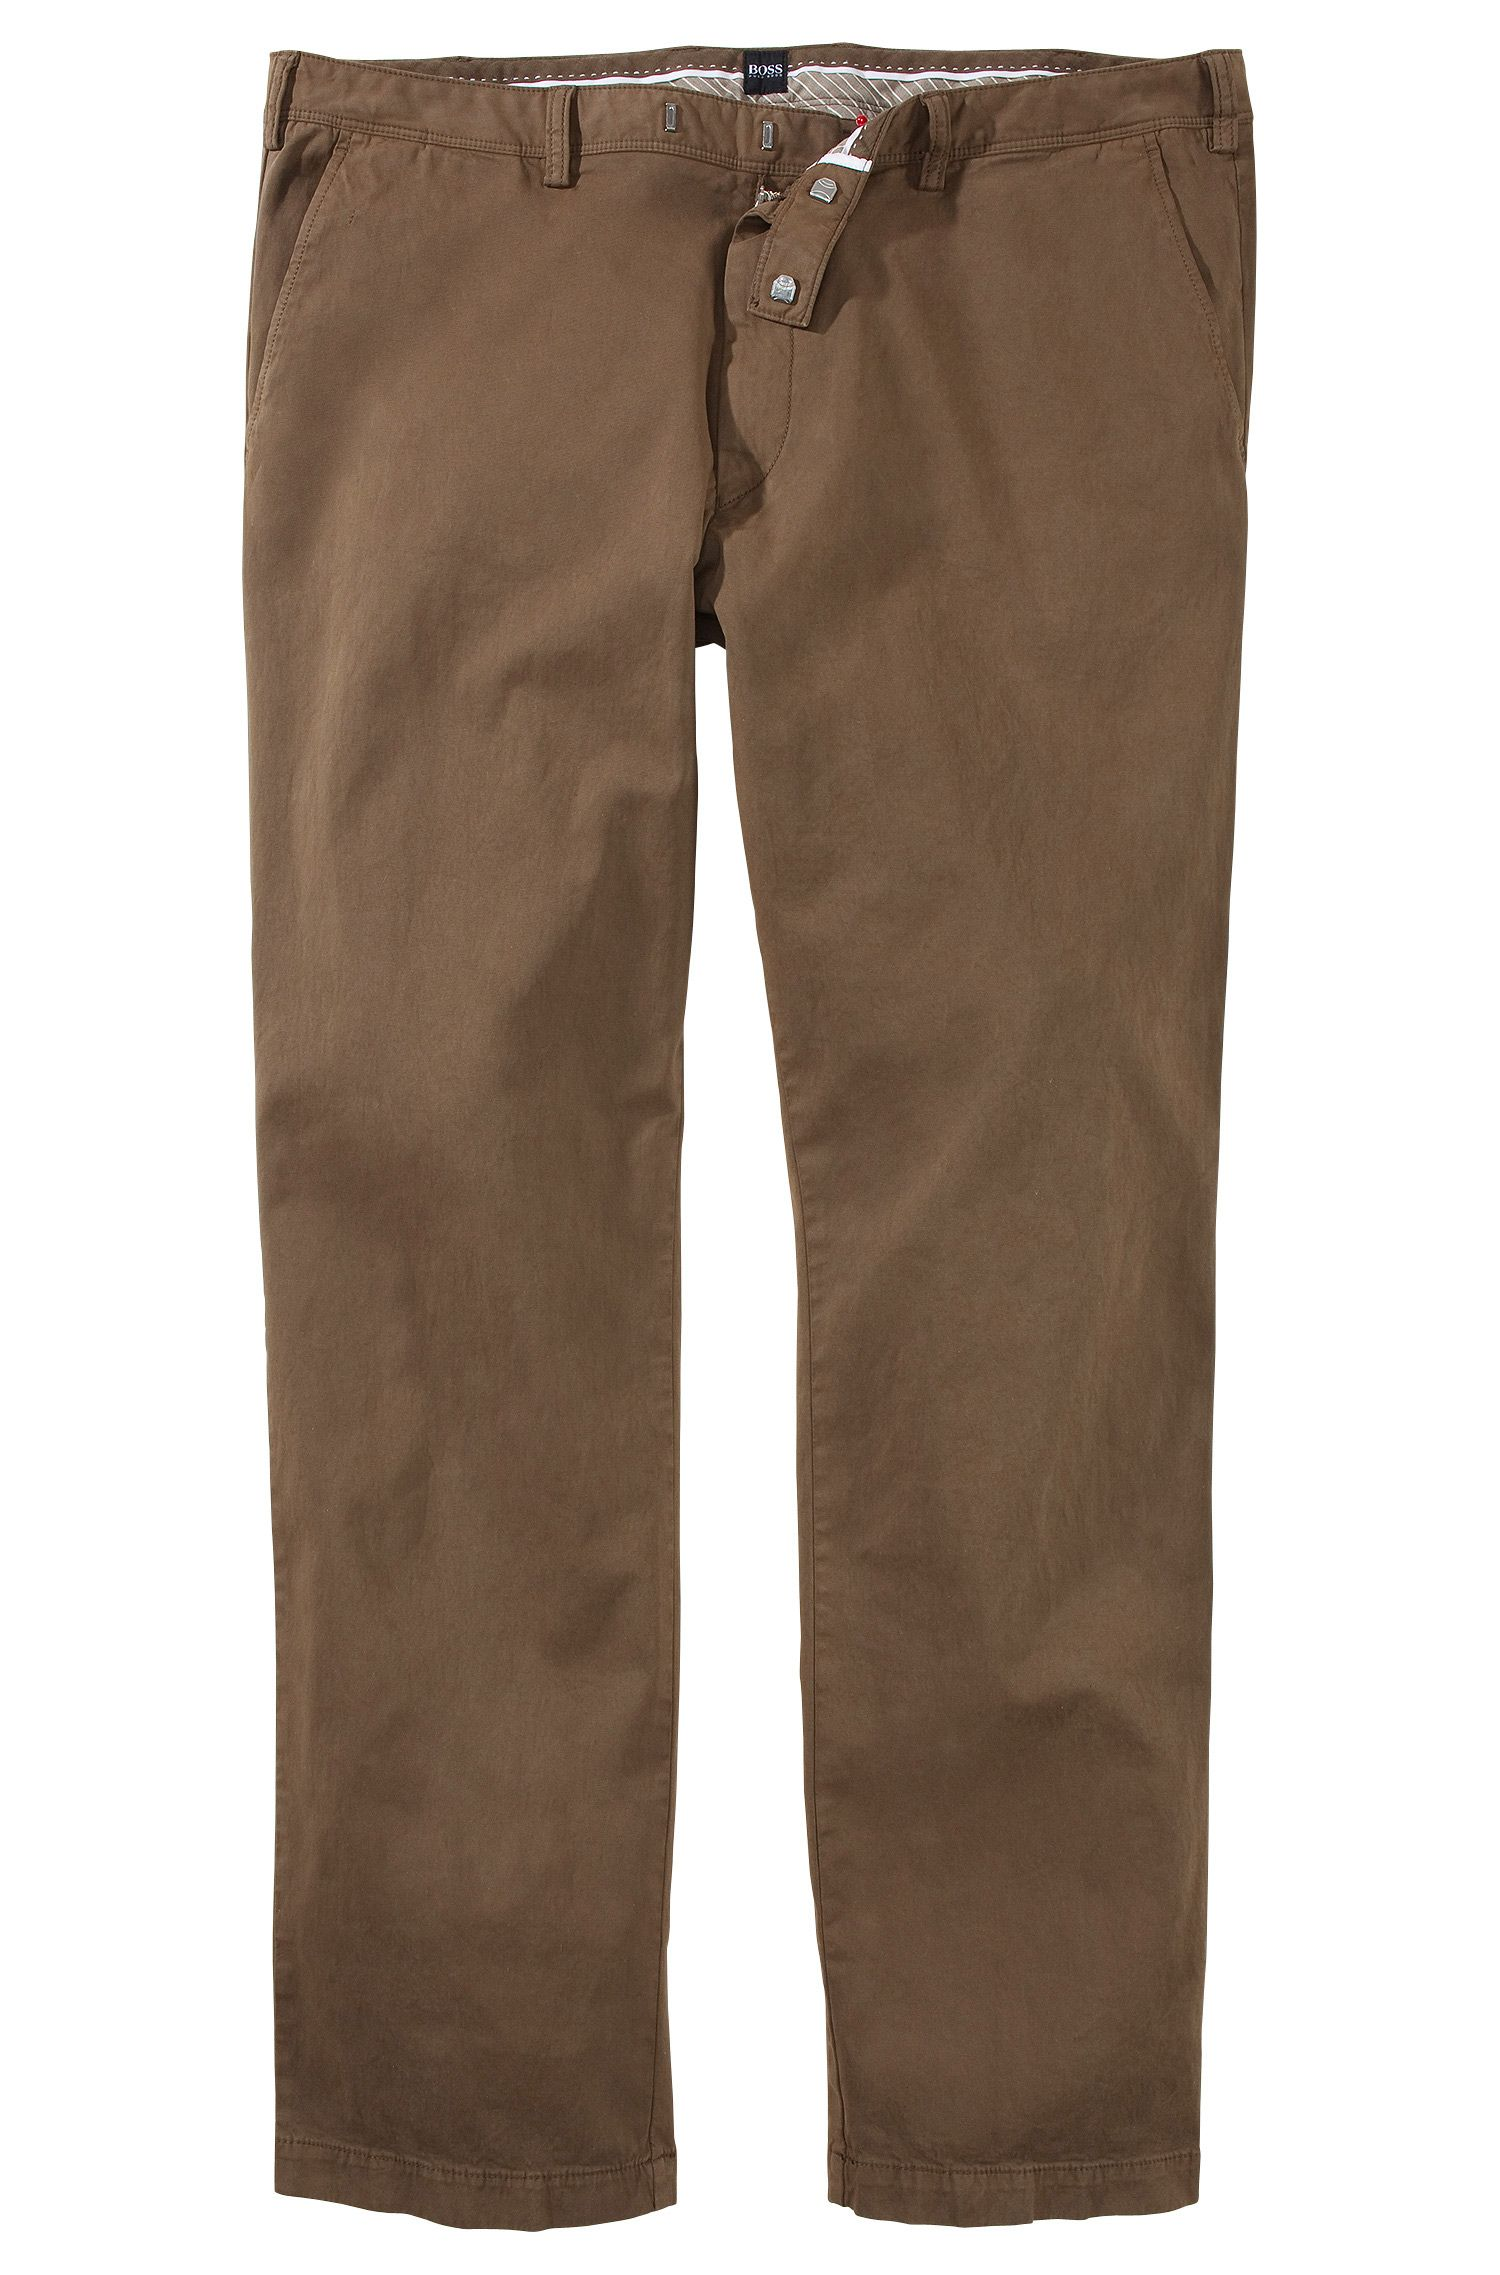 Pantalon chino, Chuckson